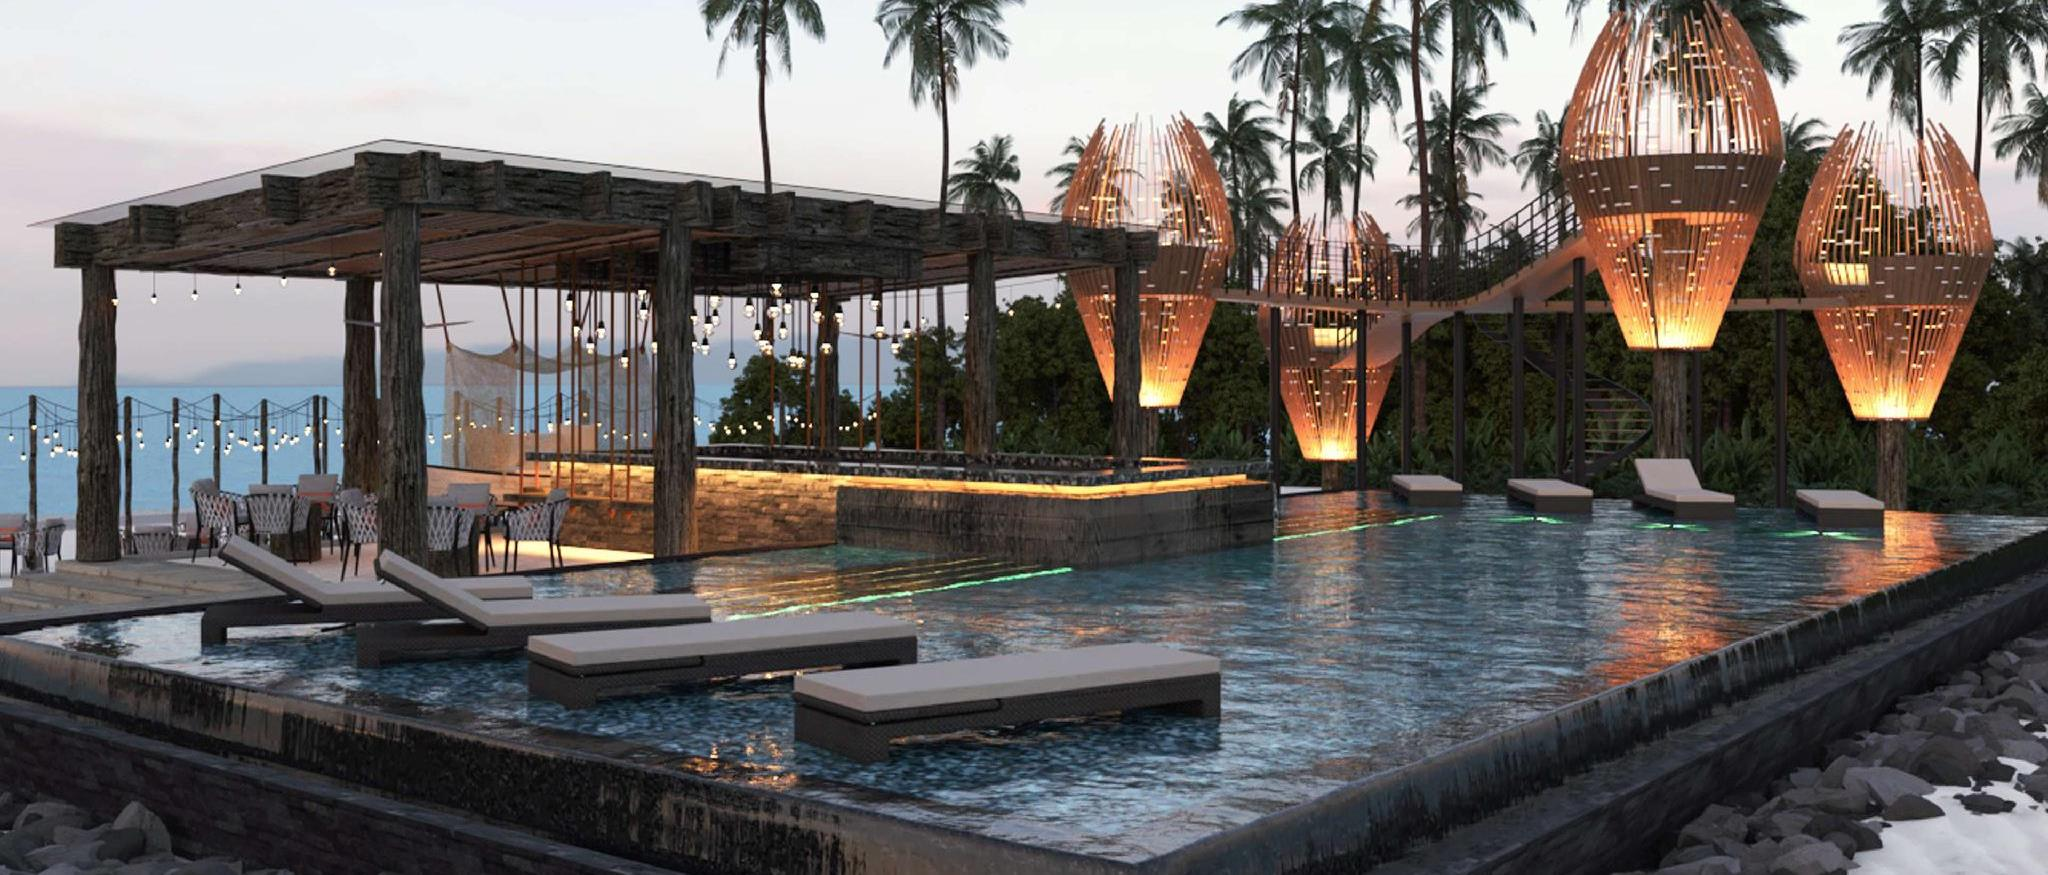 Radisson Blu Resort Maldives Image